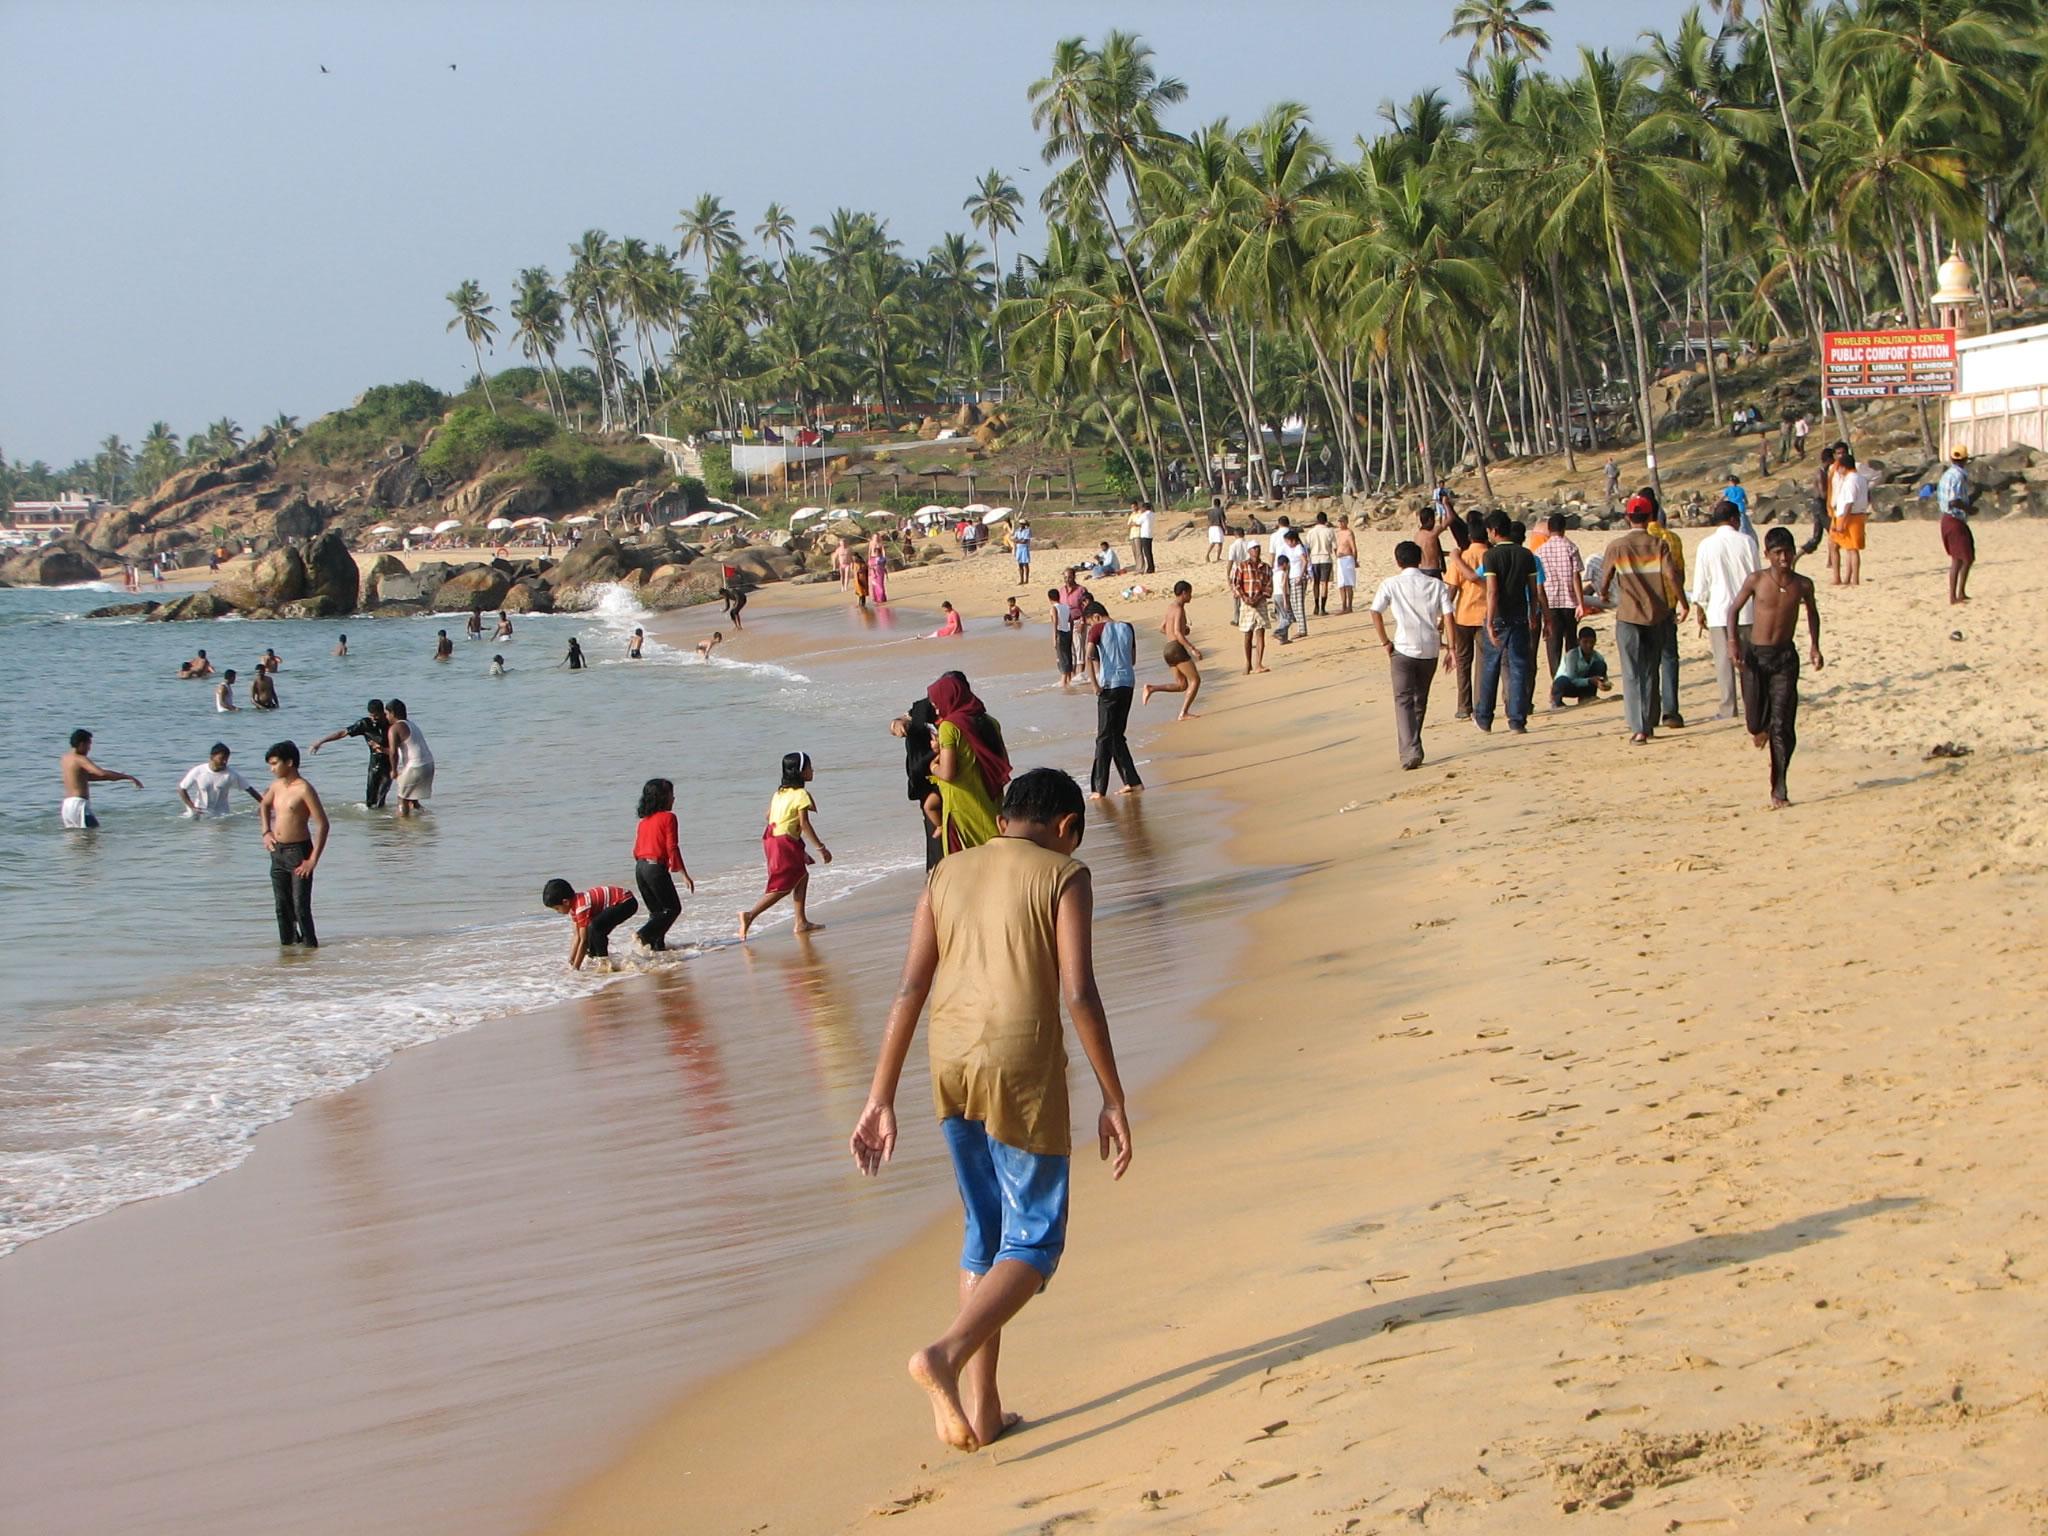 Kovalam beach photos / life-beach.JPG: www.airflights.to/Thiruvananthapuram/Kovalam/Kovalam-beach/pages...